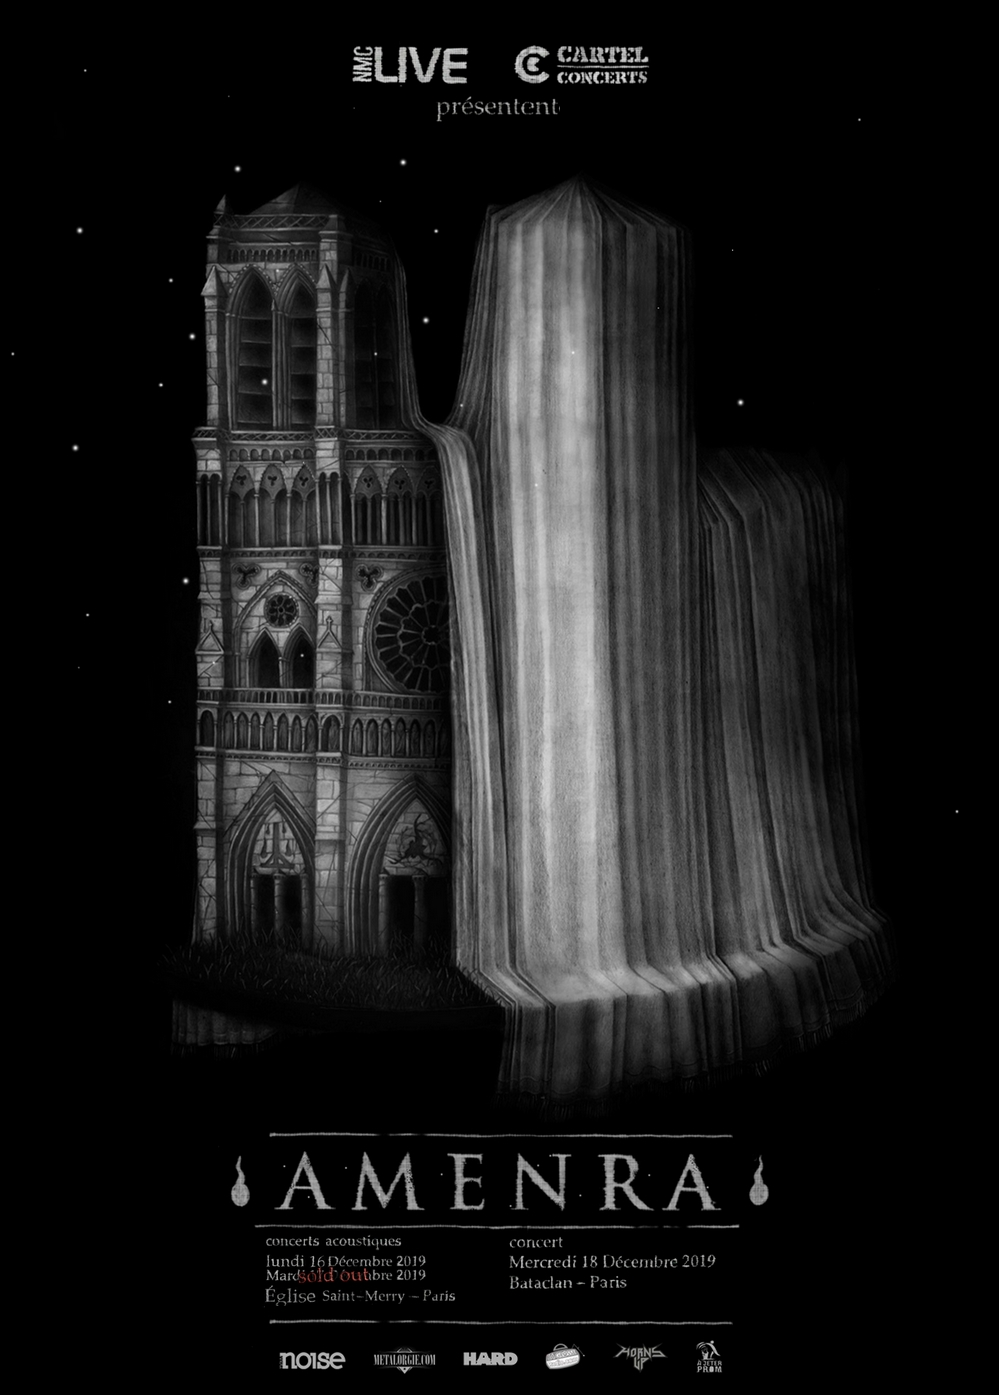 Amenra, Tour, Paris, 2019, Bataclan